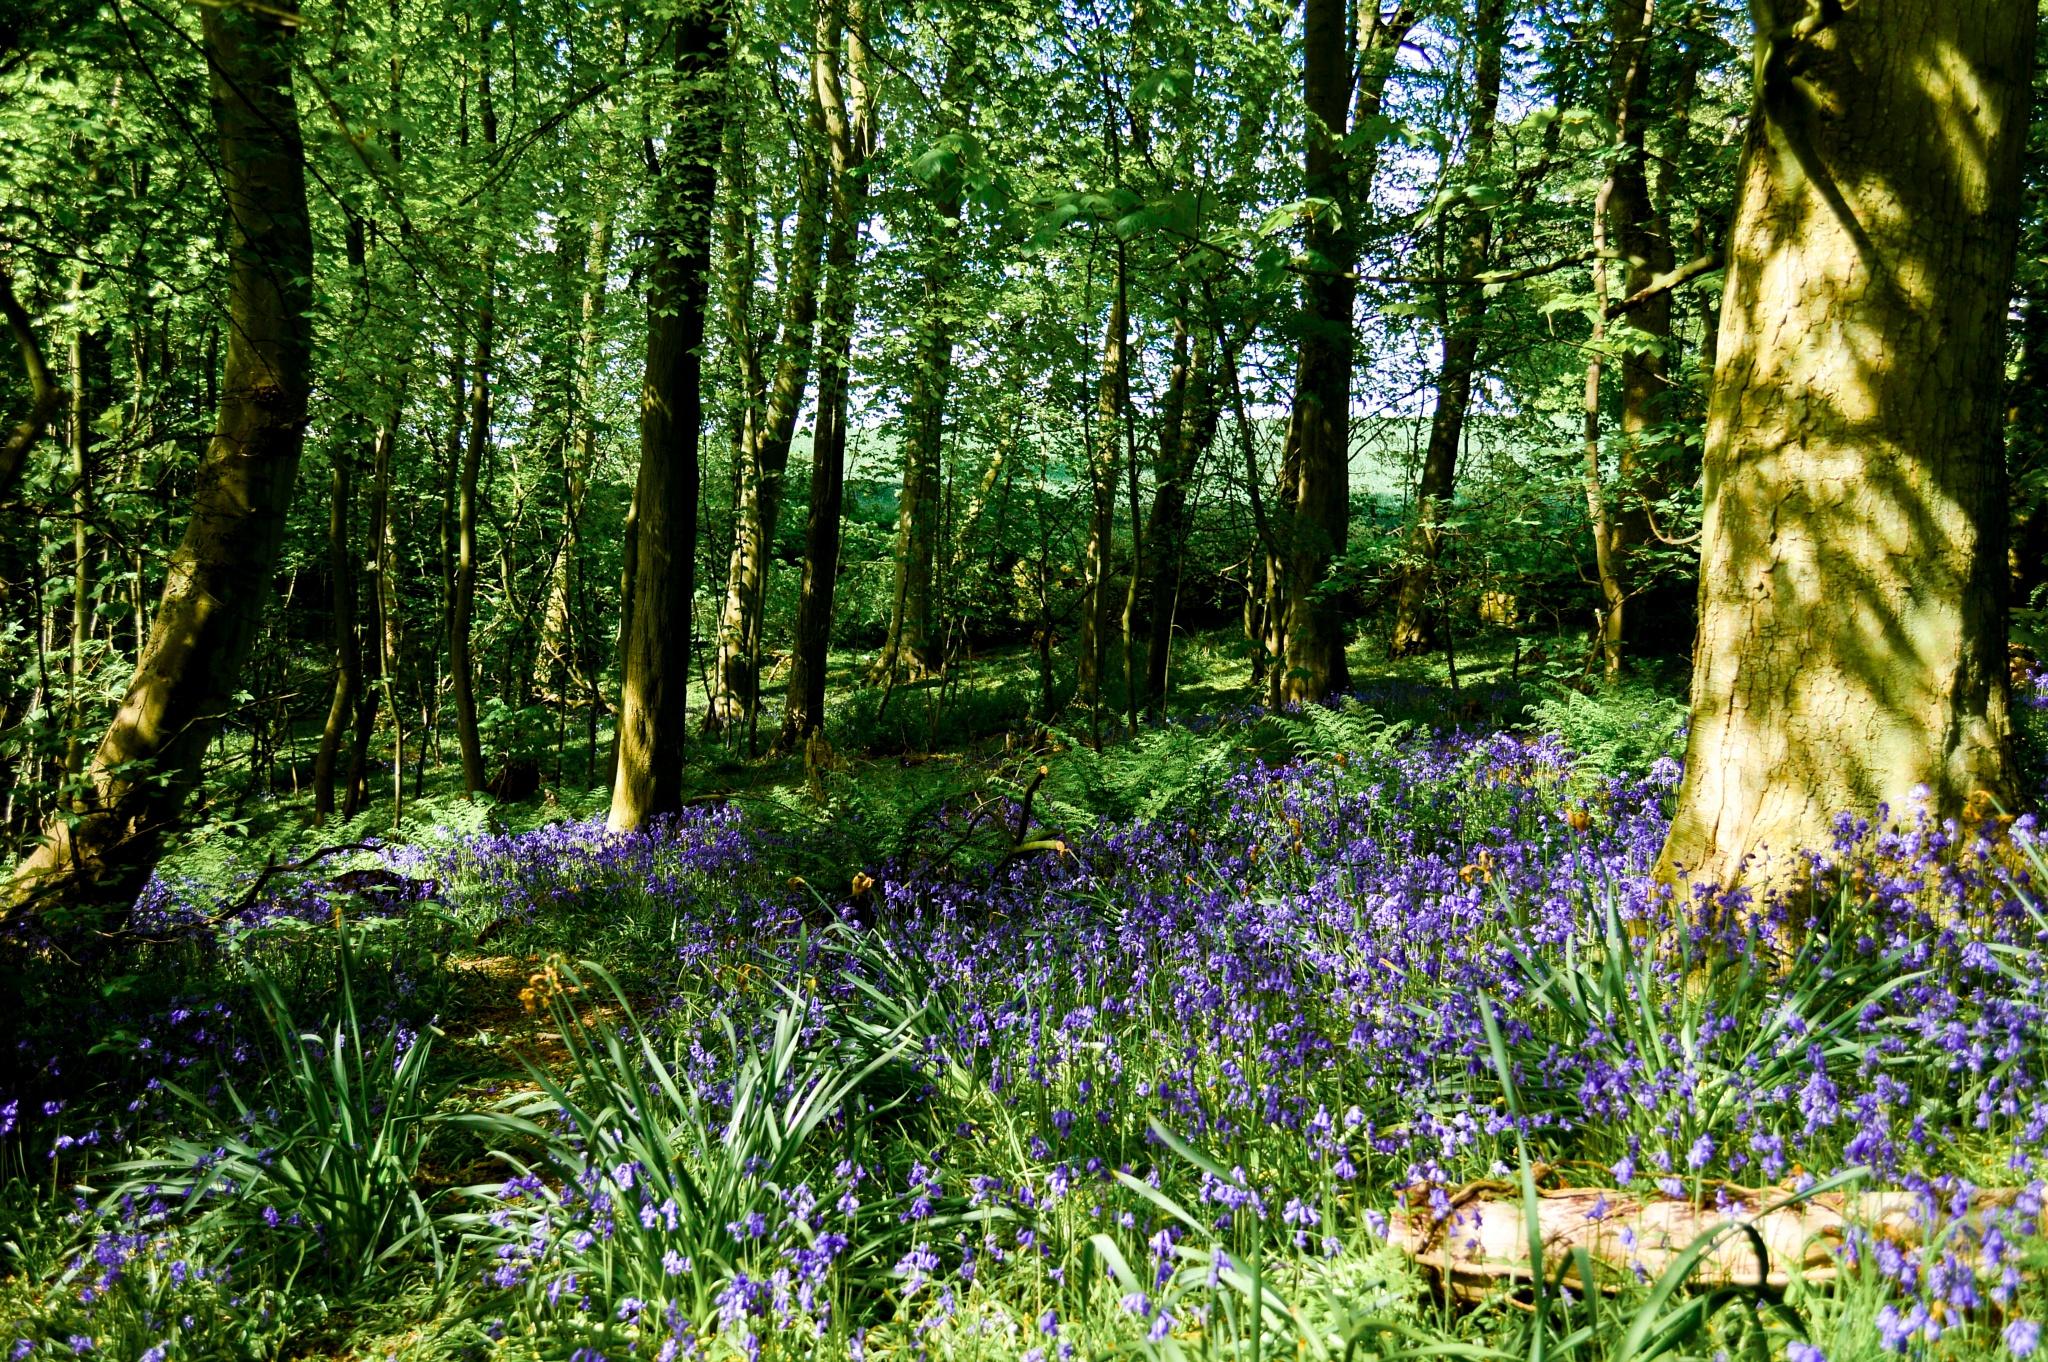 Bluebell wood by John White